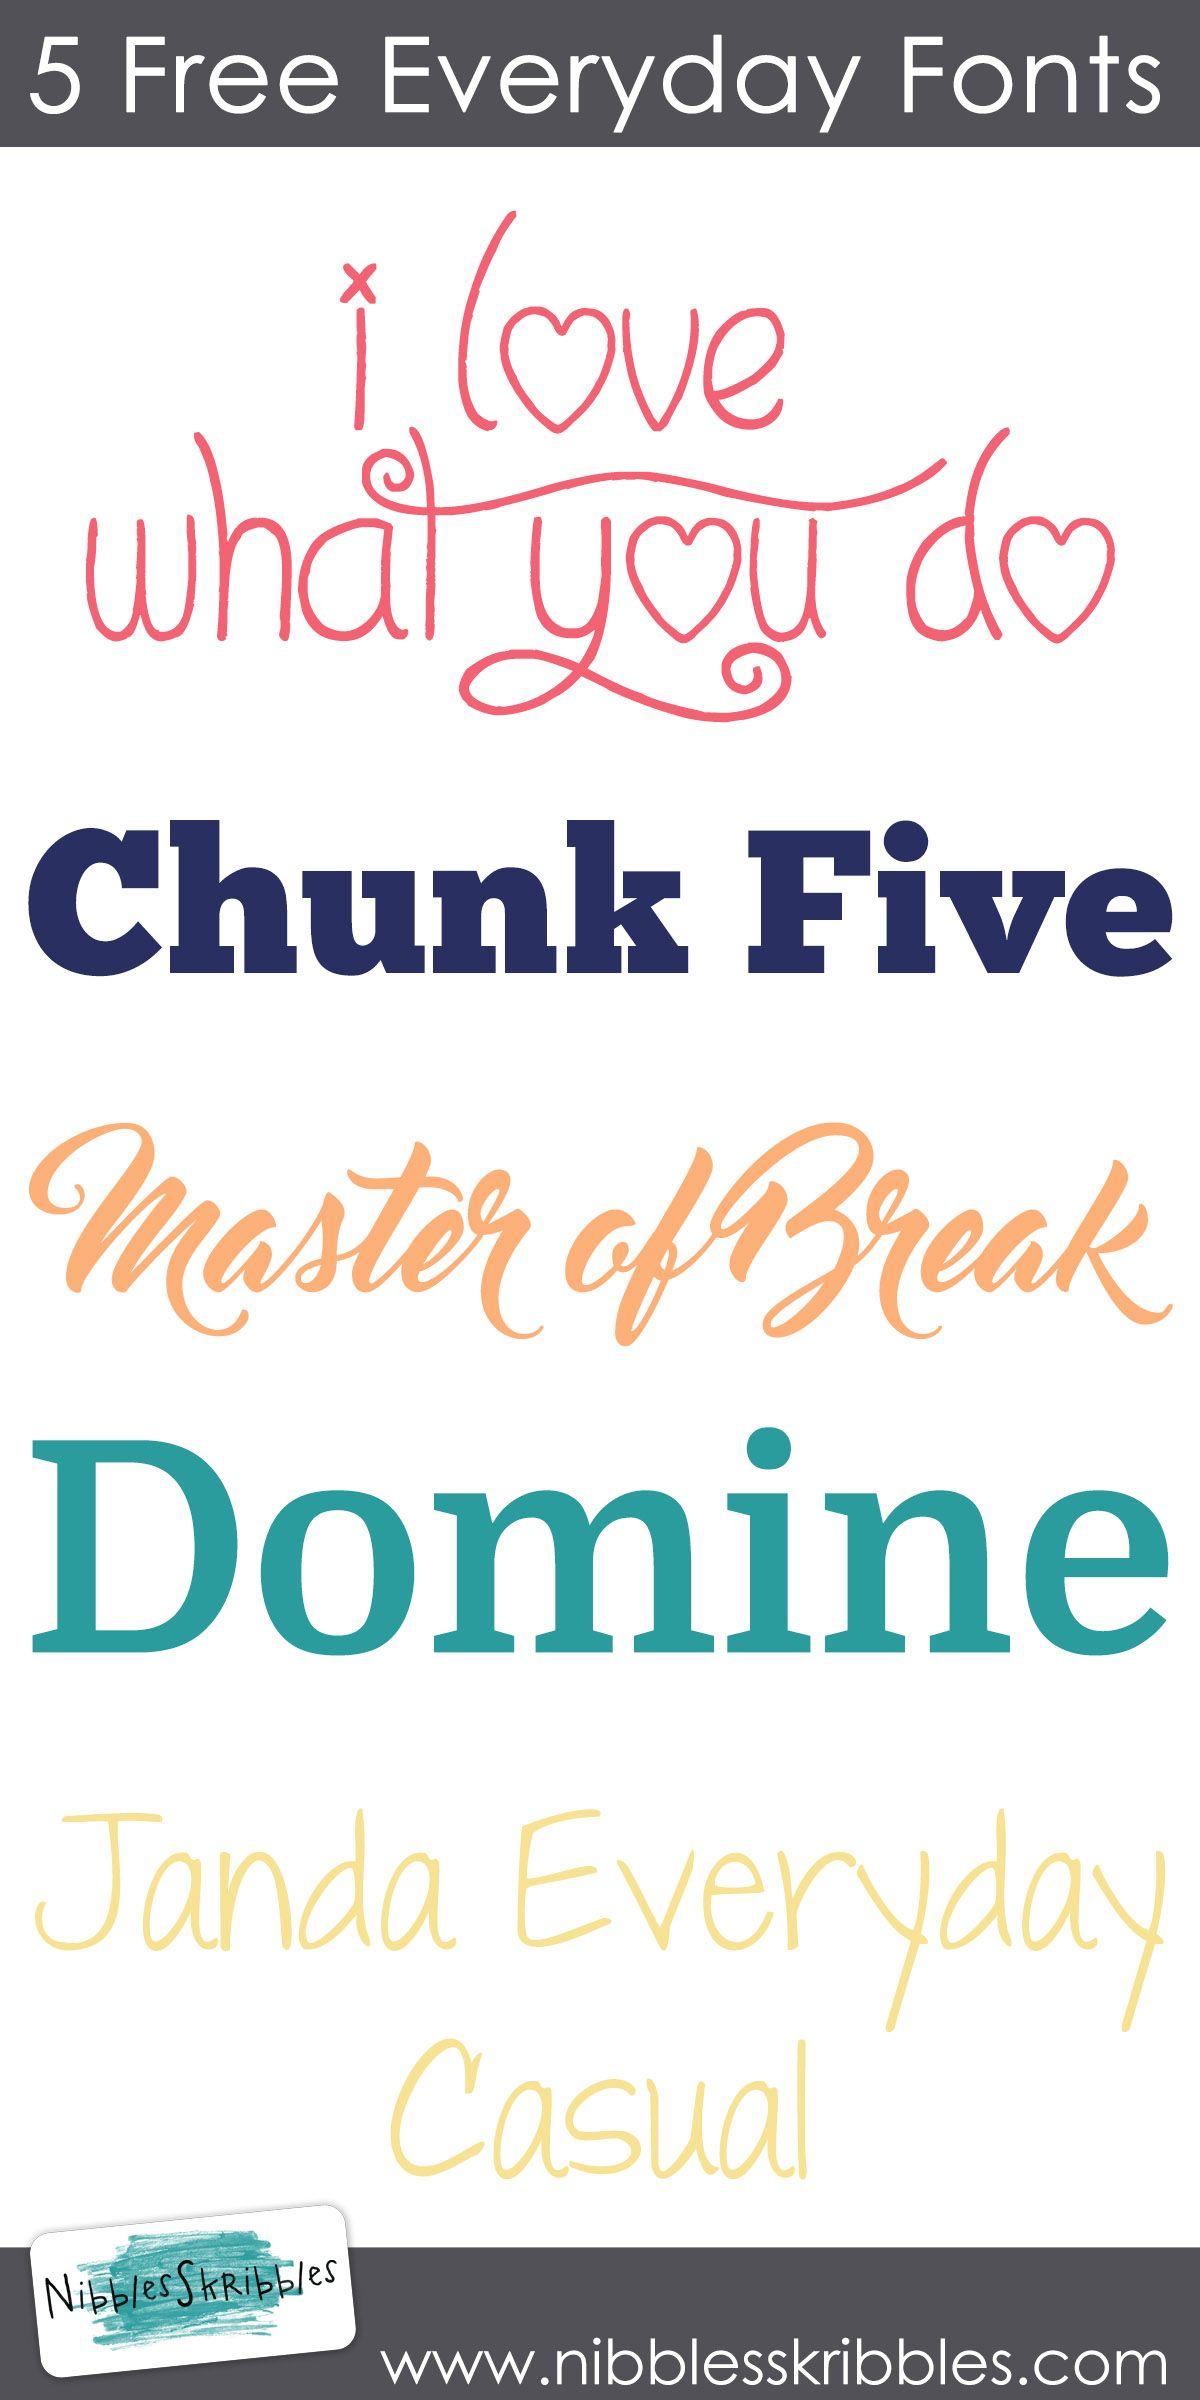 5 Free Everyday Fonts Nibbles Skribbles Happy New Year Friends Free Digital Scrapbooking